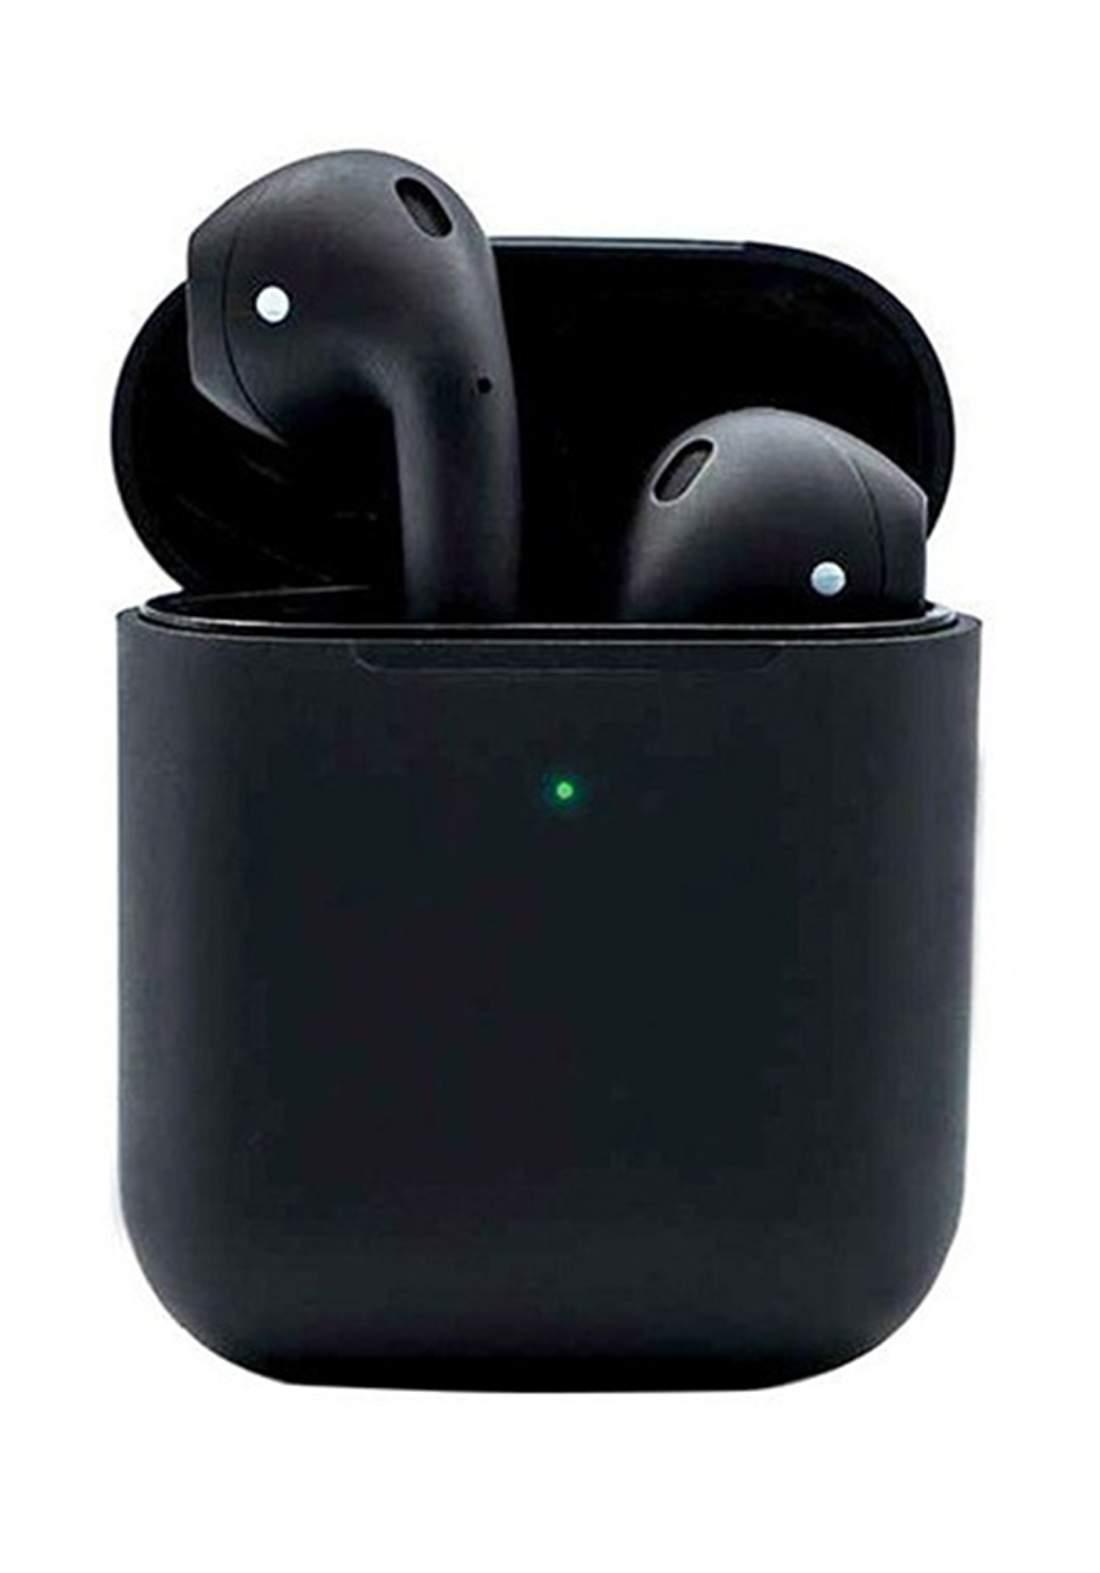 Porodo Soundtec Wireless Earbuds سماعة لا سلكية